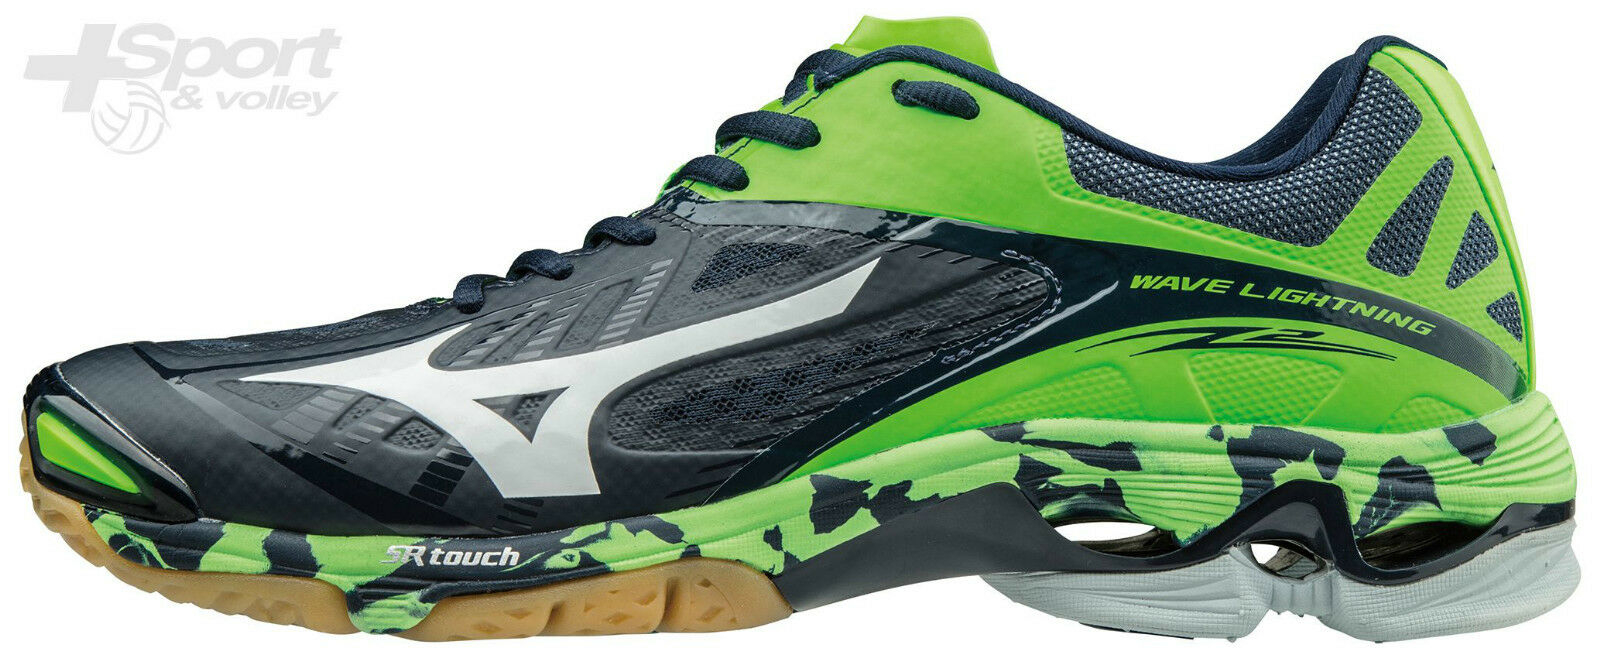 Scarpa volley Mizuno Wave Lightning Z2 Low Uomo Uomo Uomo V1GA160006 447e2c